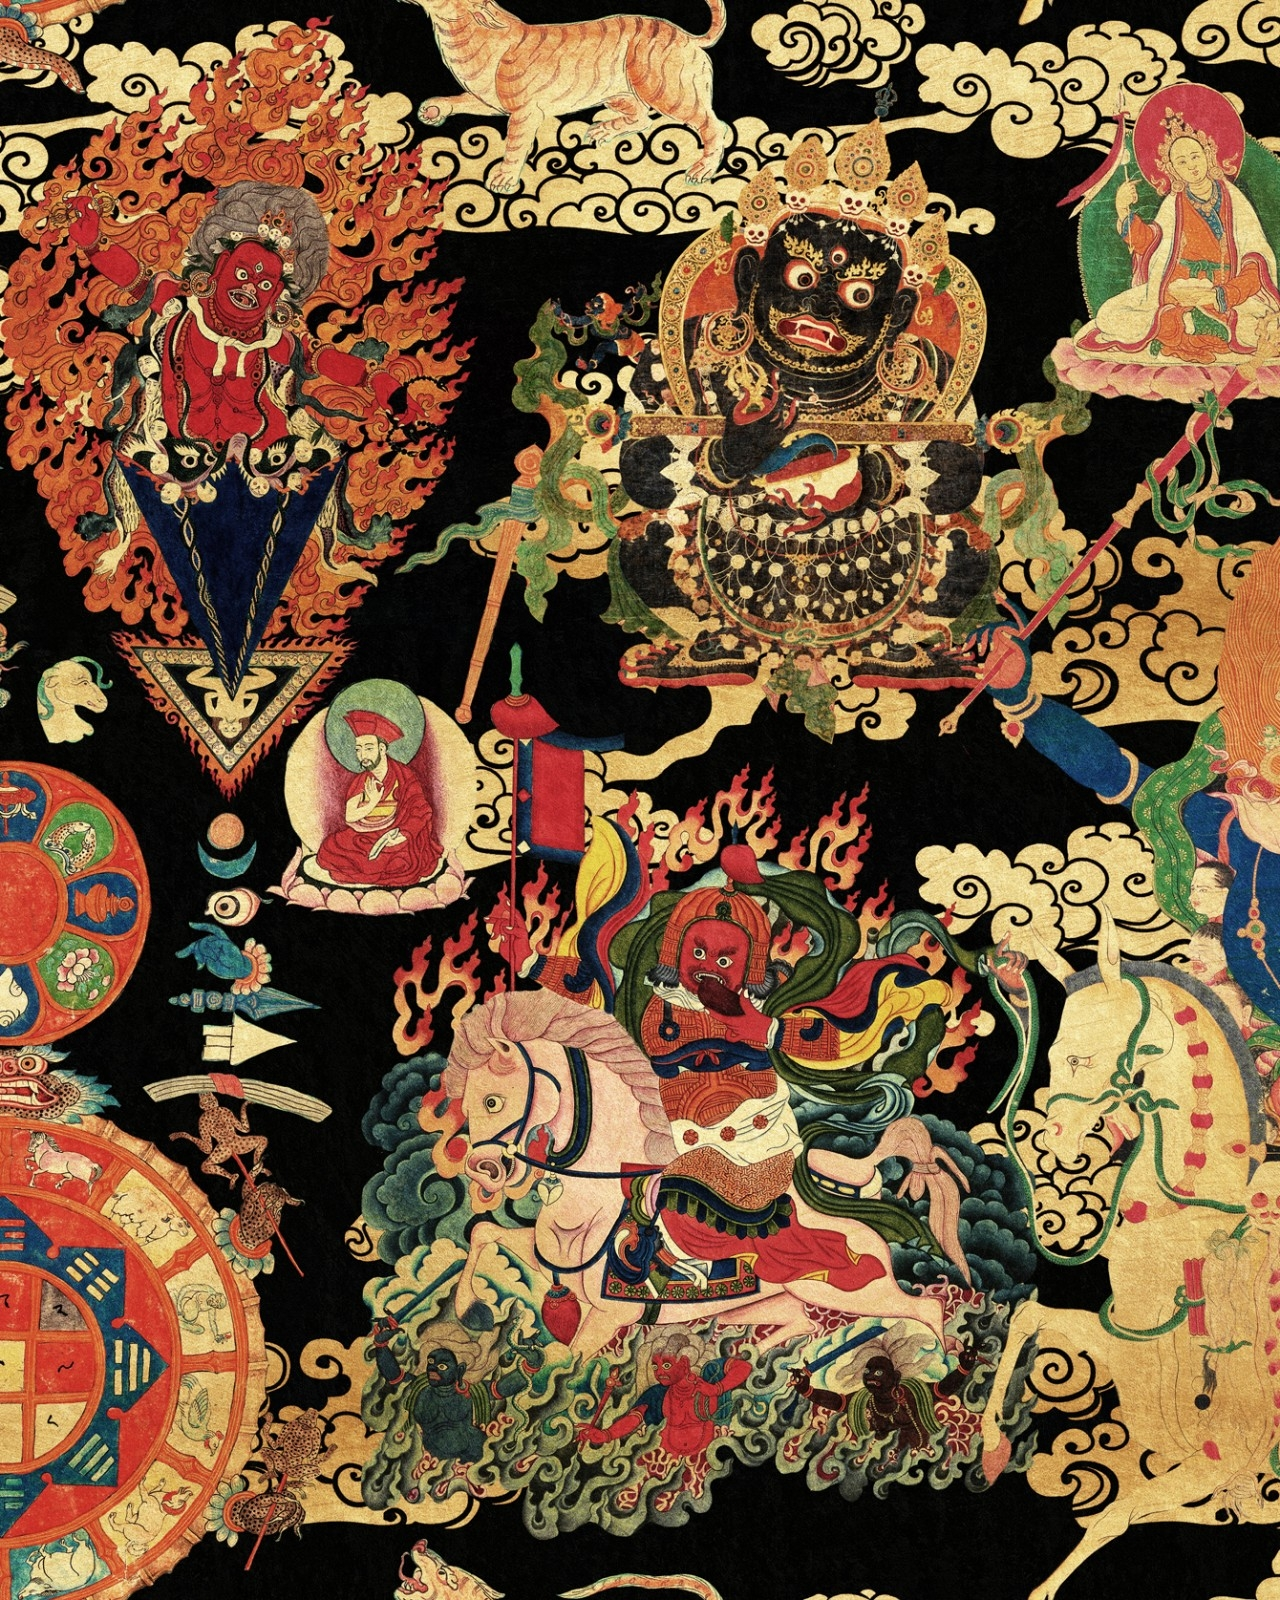 Tapet Imprimat Digital Tibetan Tapestry Metallic Edition - 4201